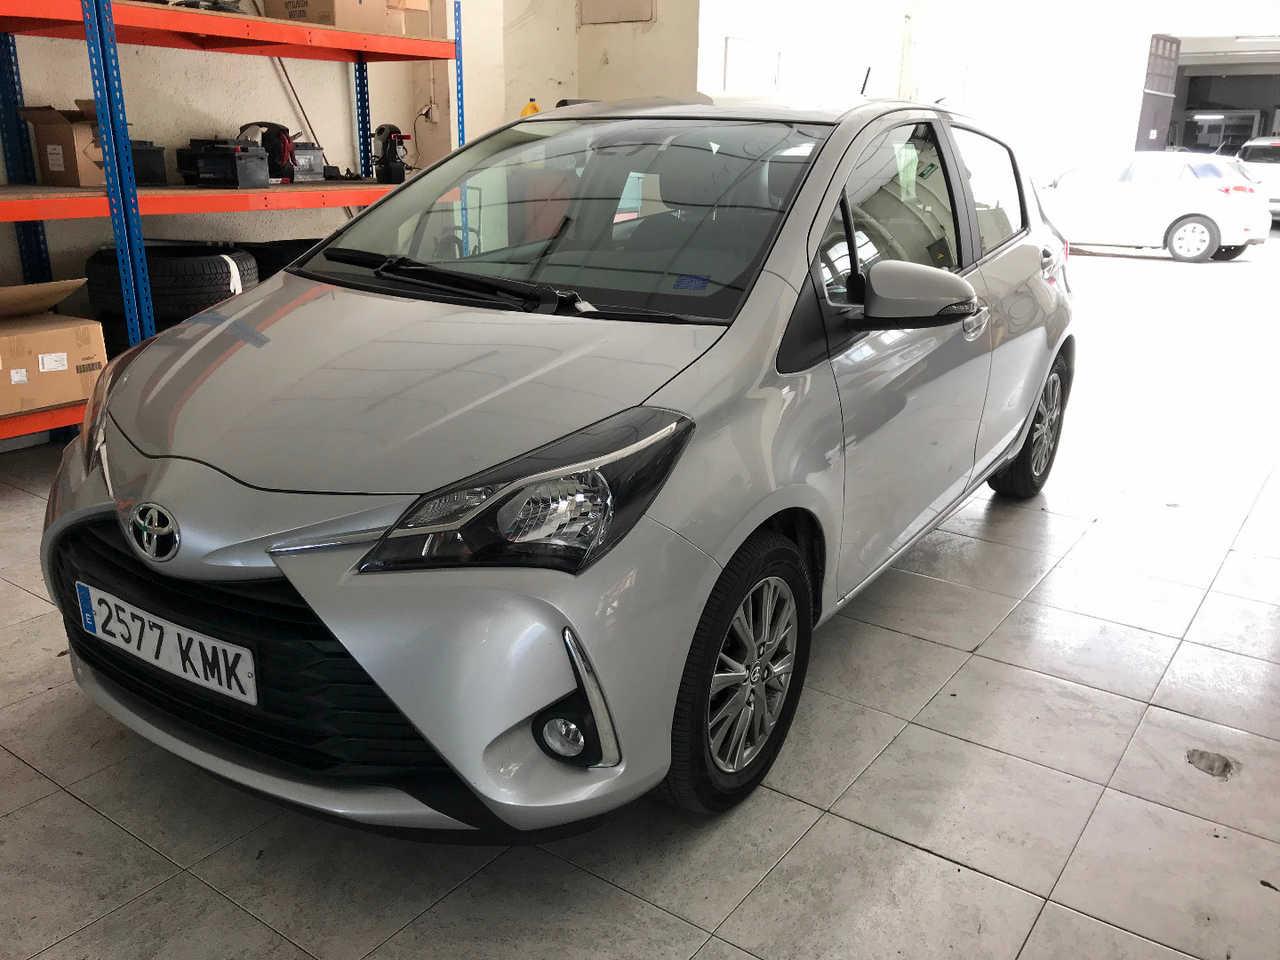 Toyota Yaris City 1.0 Gasolina   - Foto 1